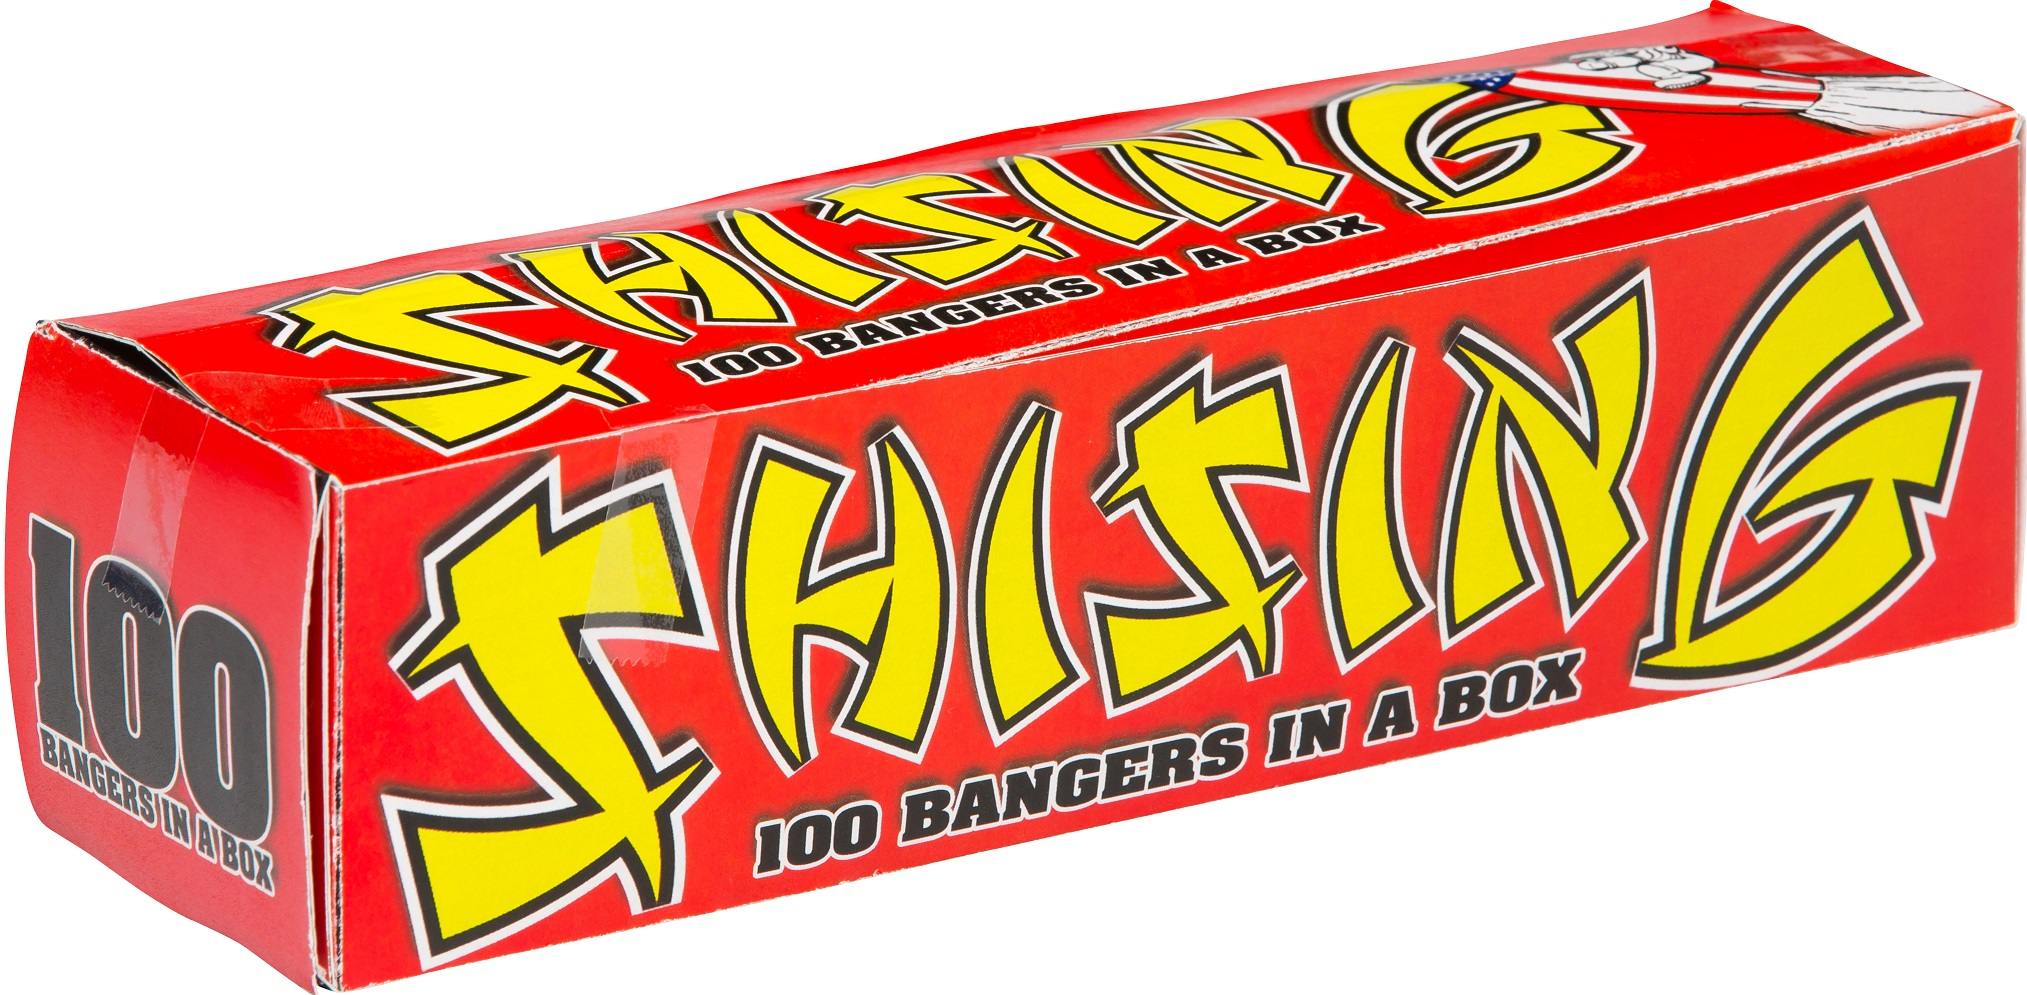 Shising crackers